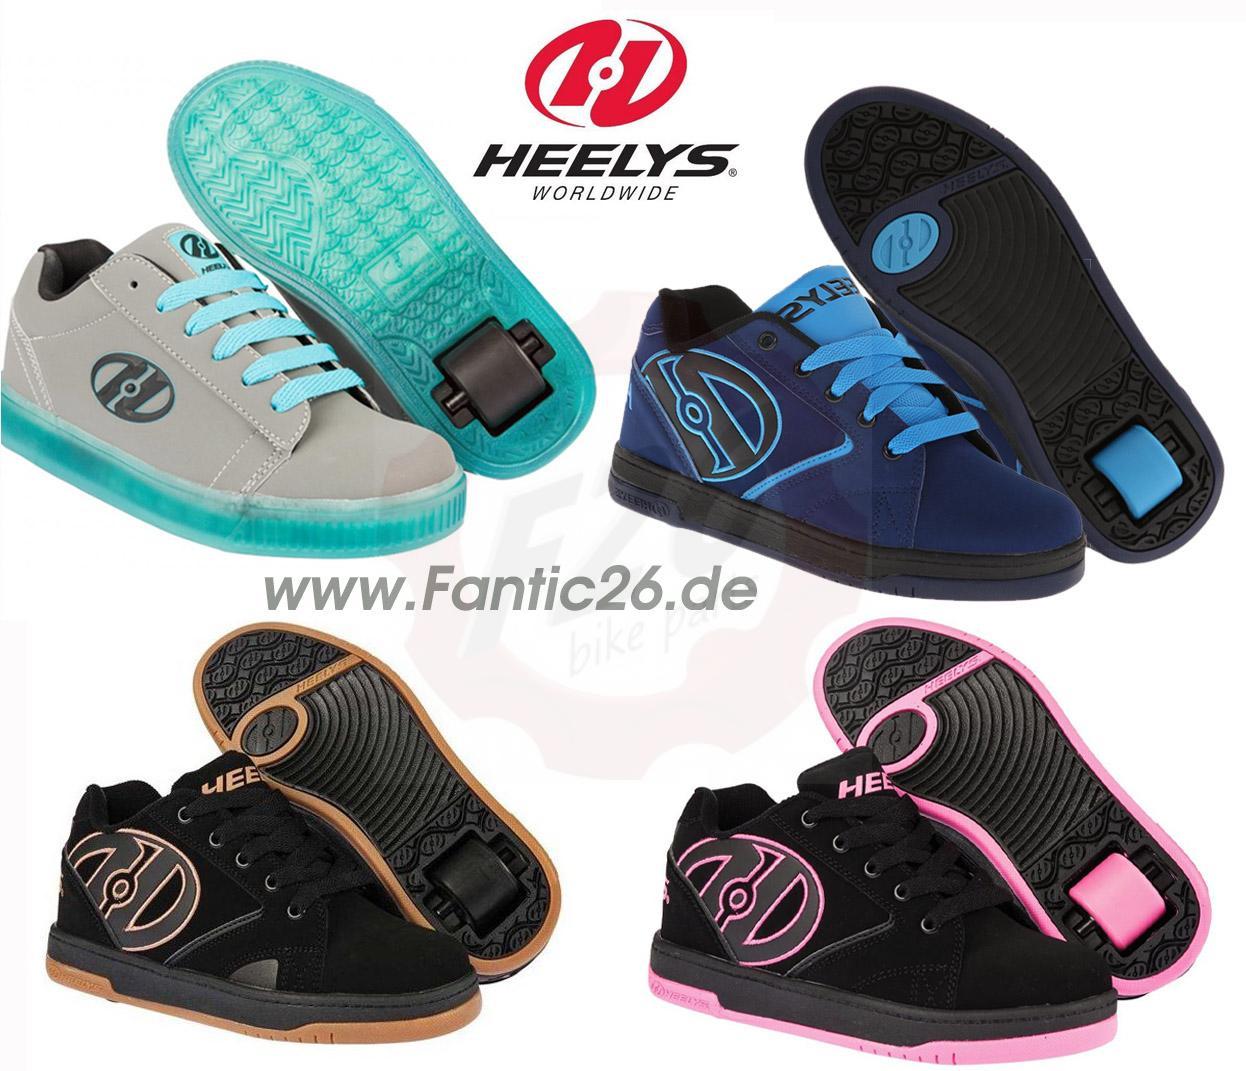 heelys propel 2 0 straight up schuhe mit rollen shoes rollschuhe inliner ebay. Black Bedroom Furniture Sets. Home Design Ideas